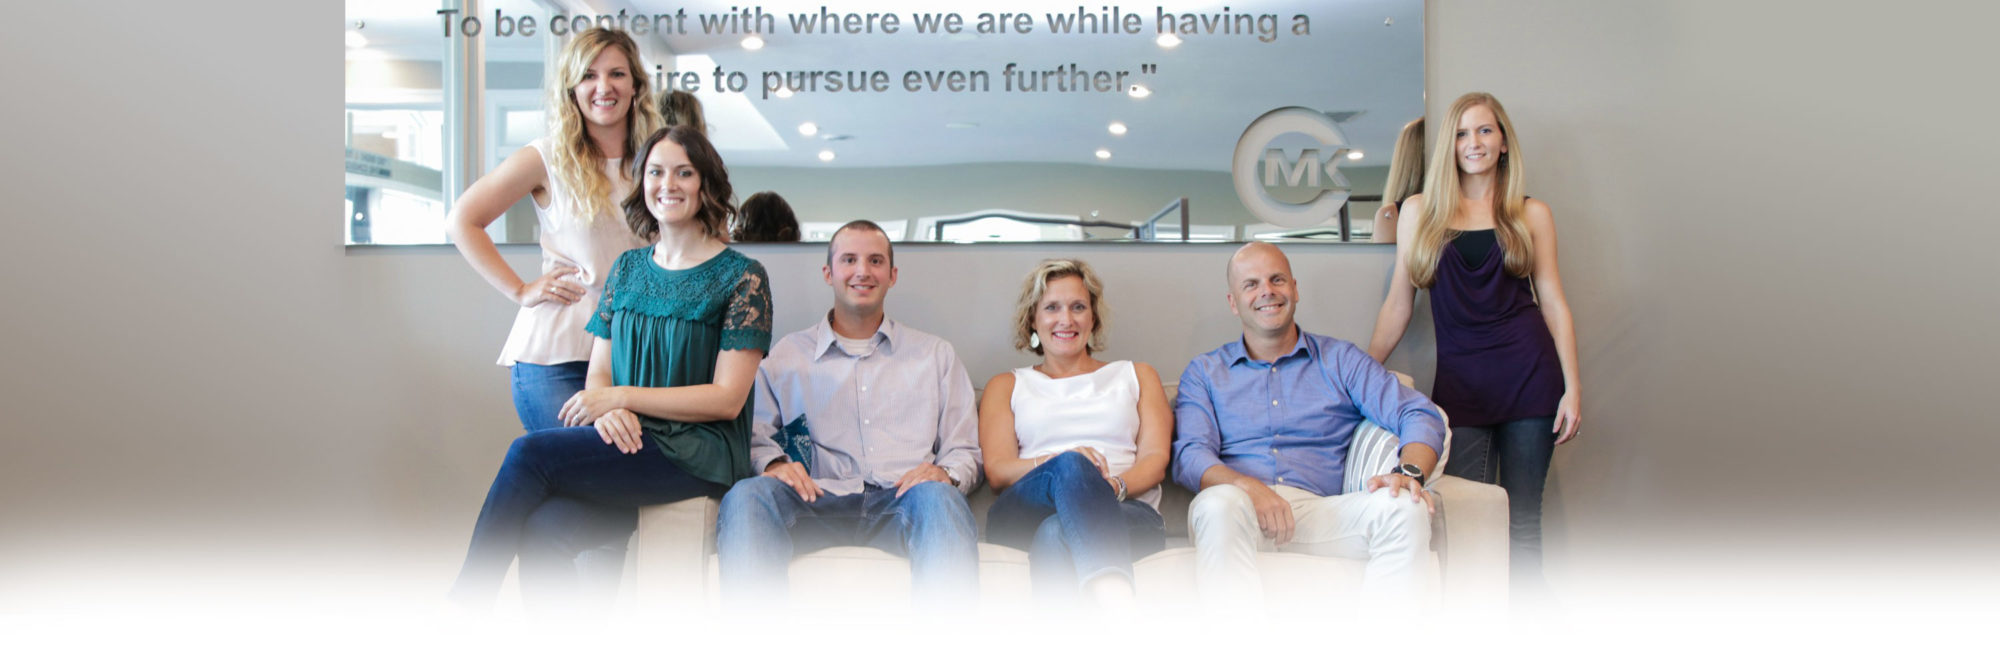 EDGE Creative Co | Digital Marketing Agency Based In New York